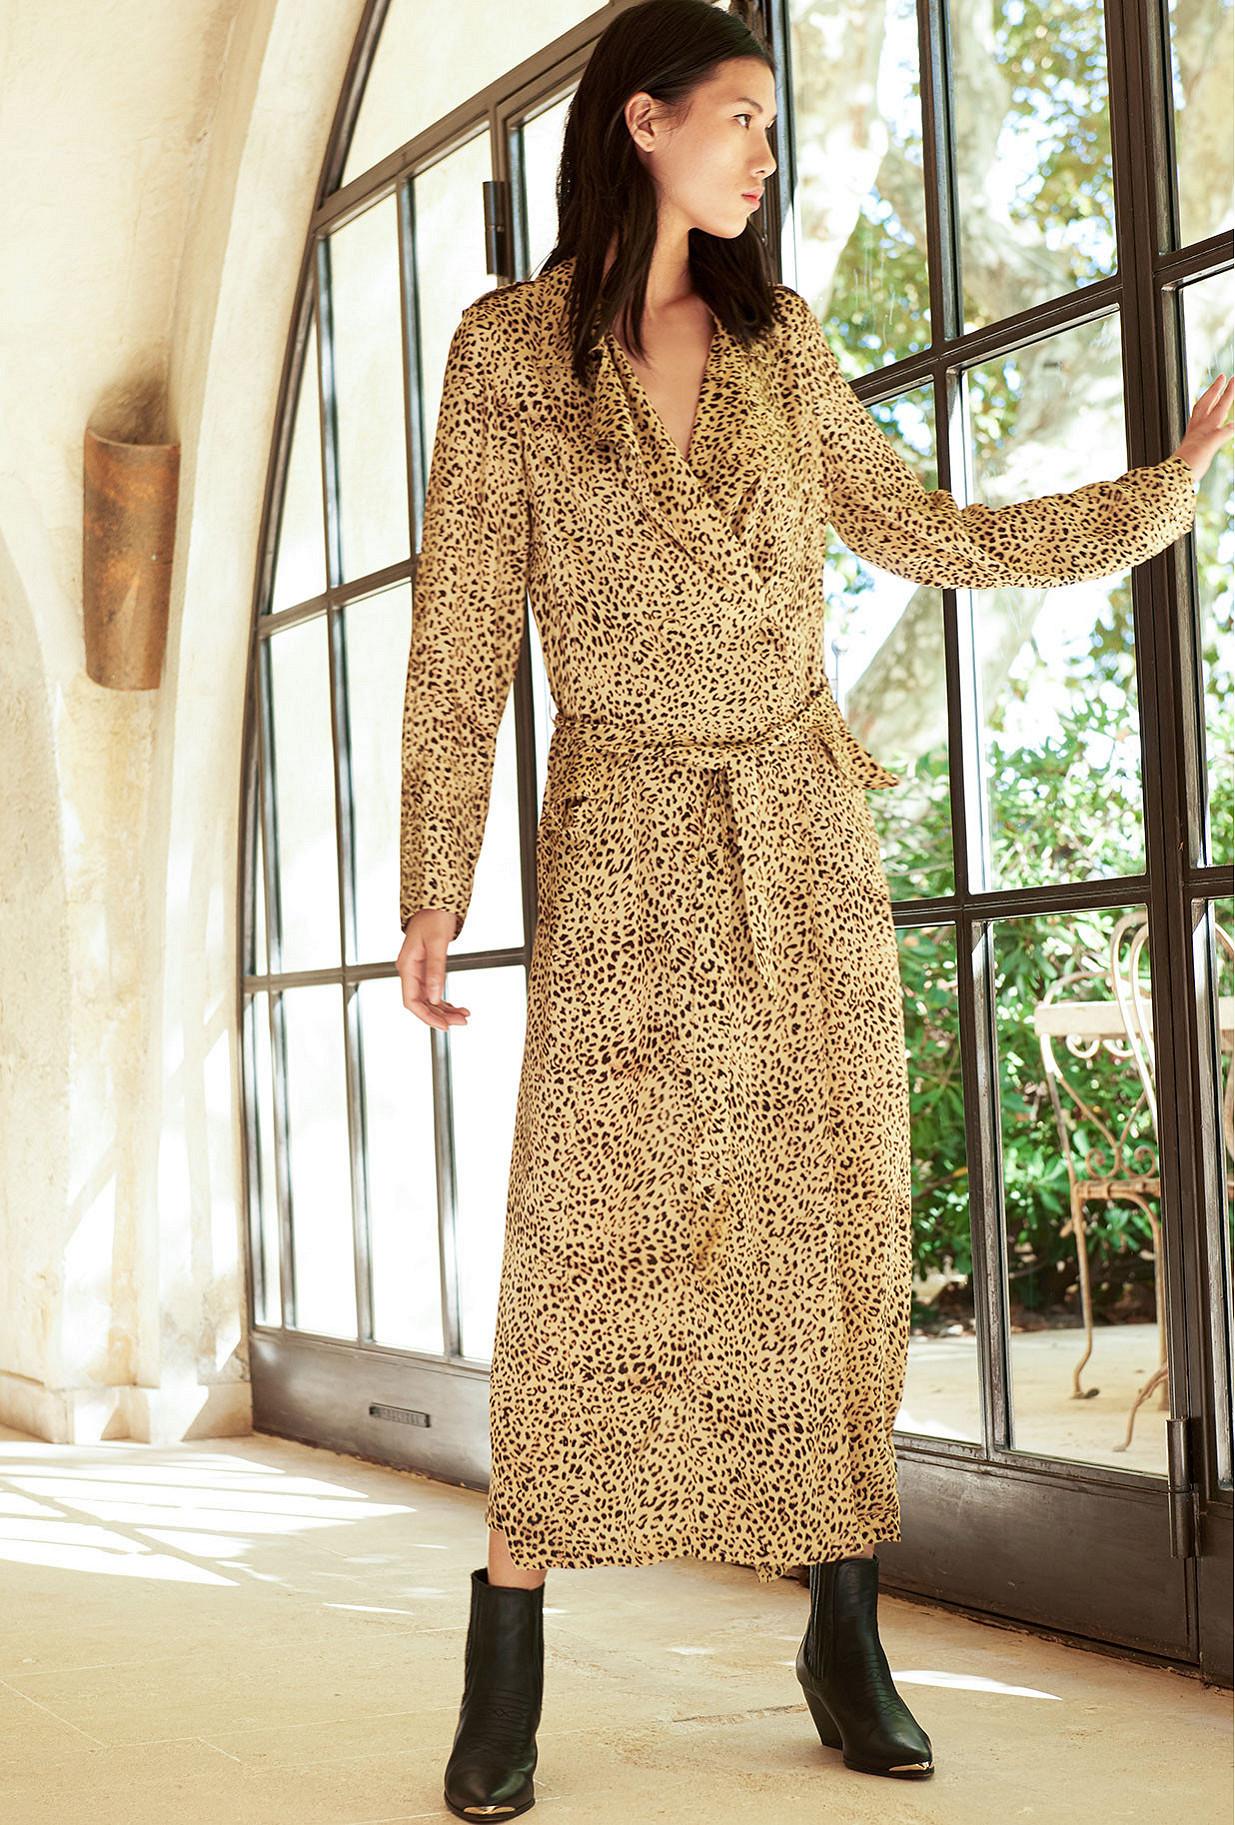 Paris clothes store Manteau  Rosita french designer fashion Paris